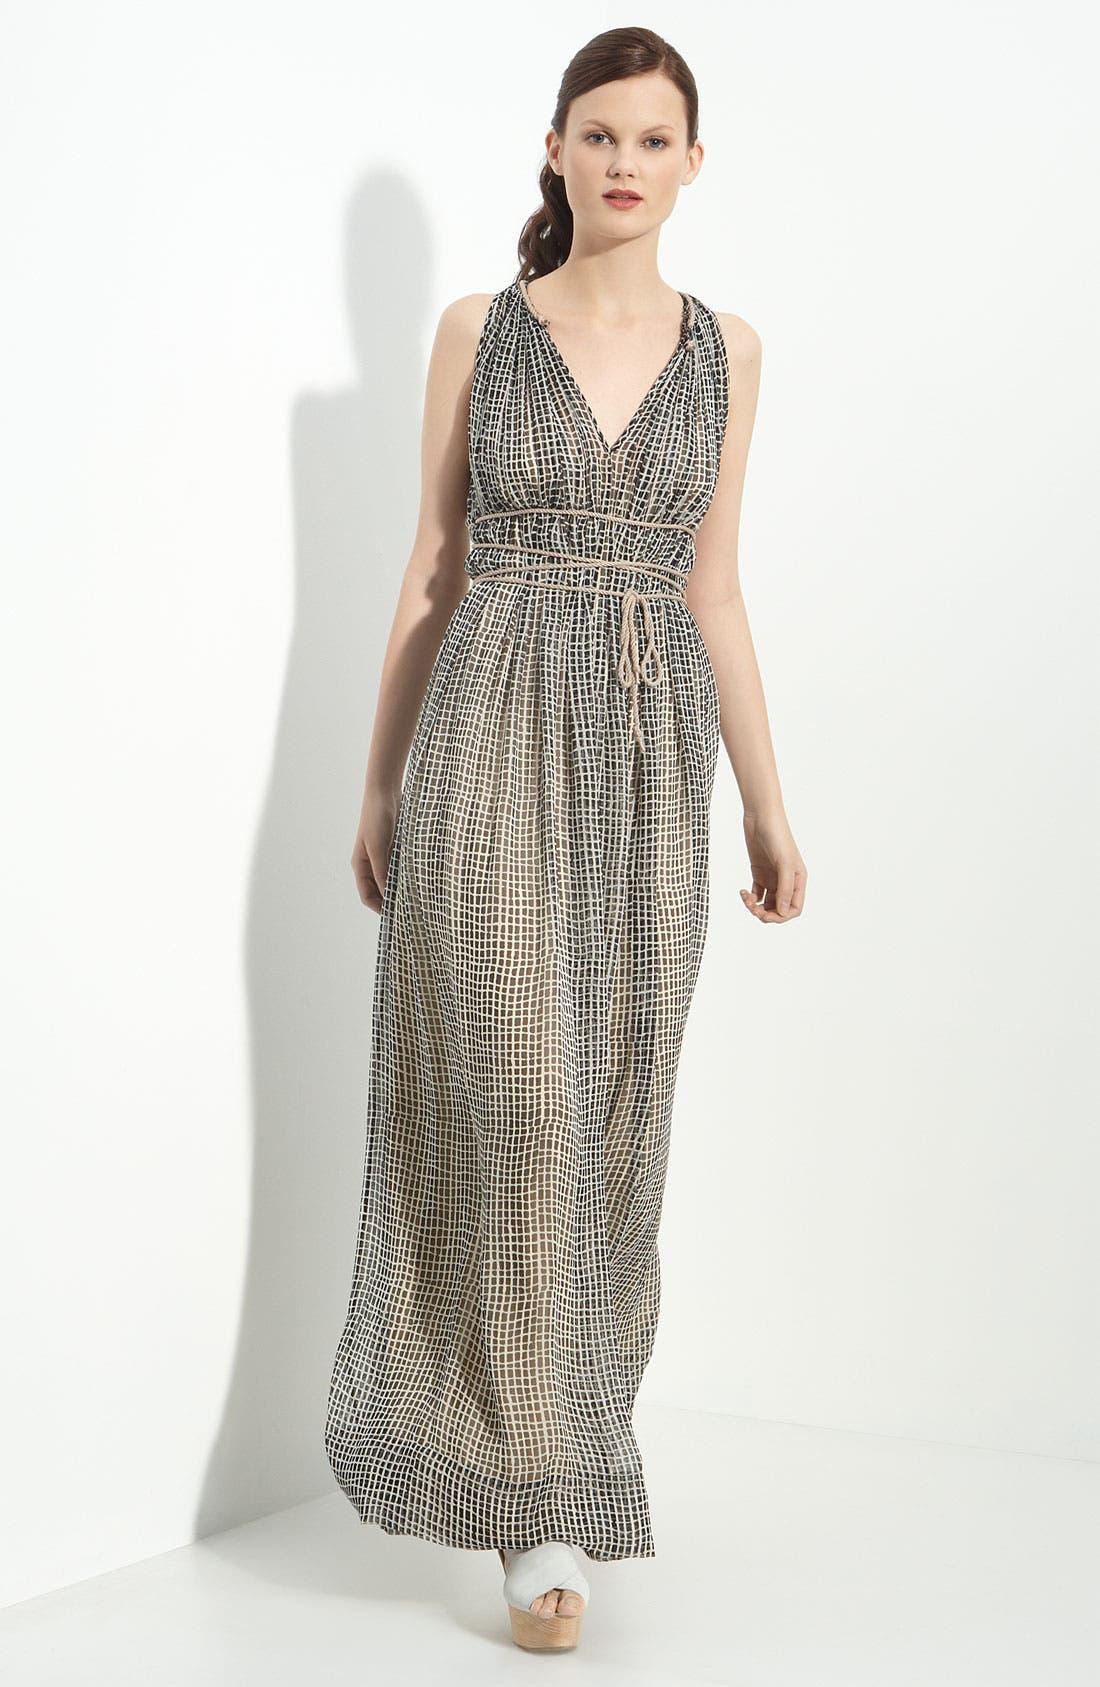 Alternate Image 1 Selected - 3.1 Phillip Lim Painted Check Print Silk Maxi Dress